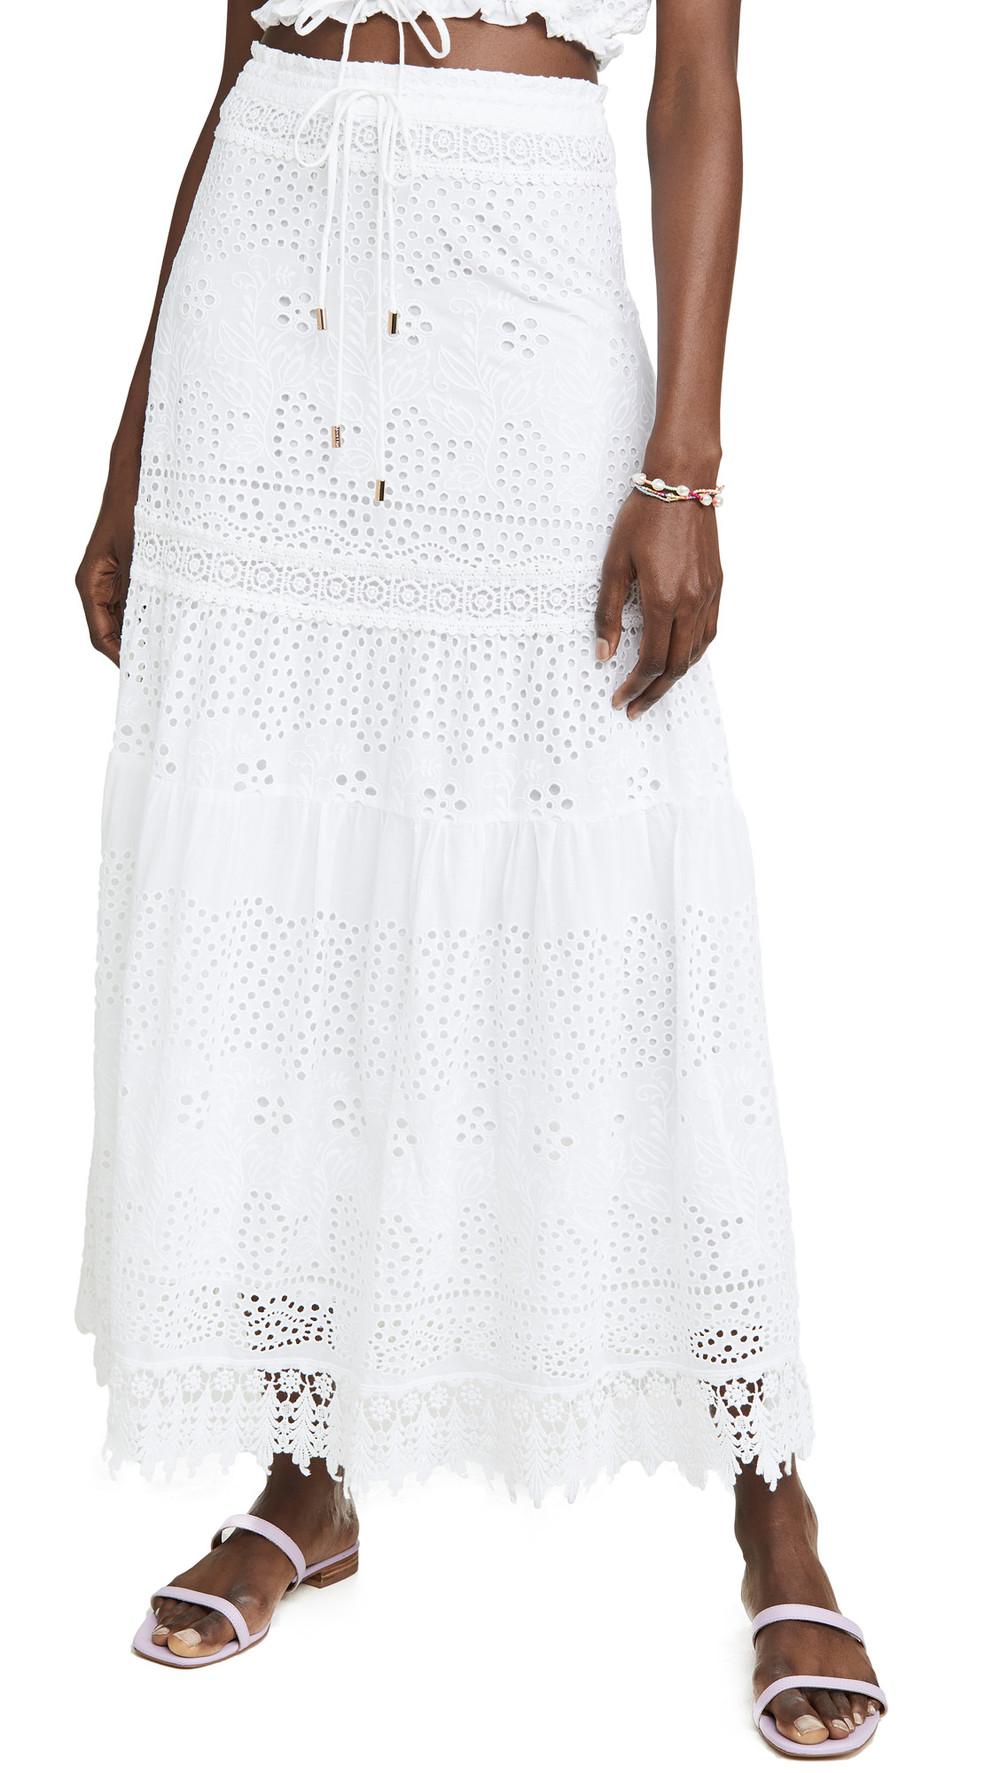 Melissa Odabash Alessia Skirt in white